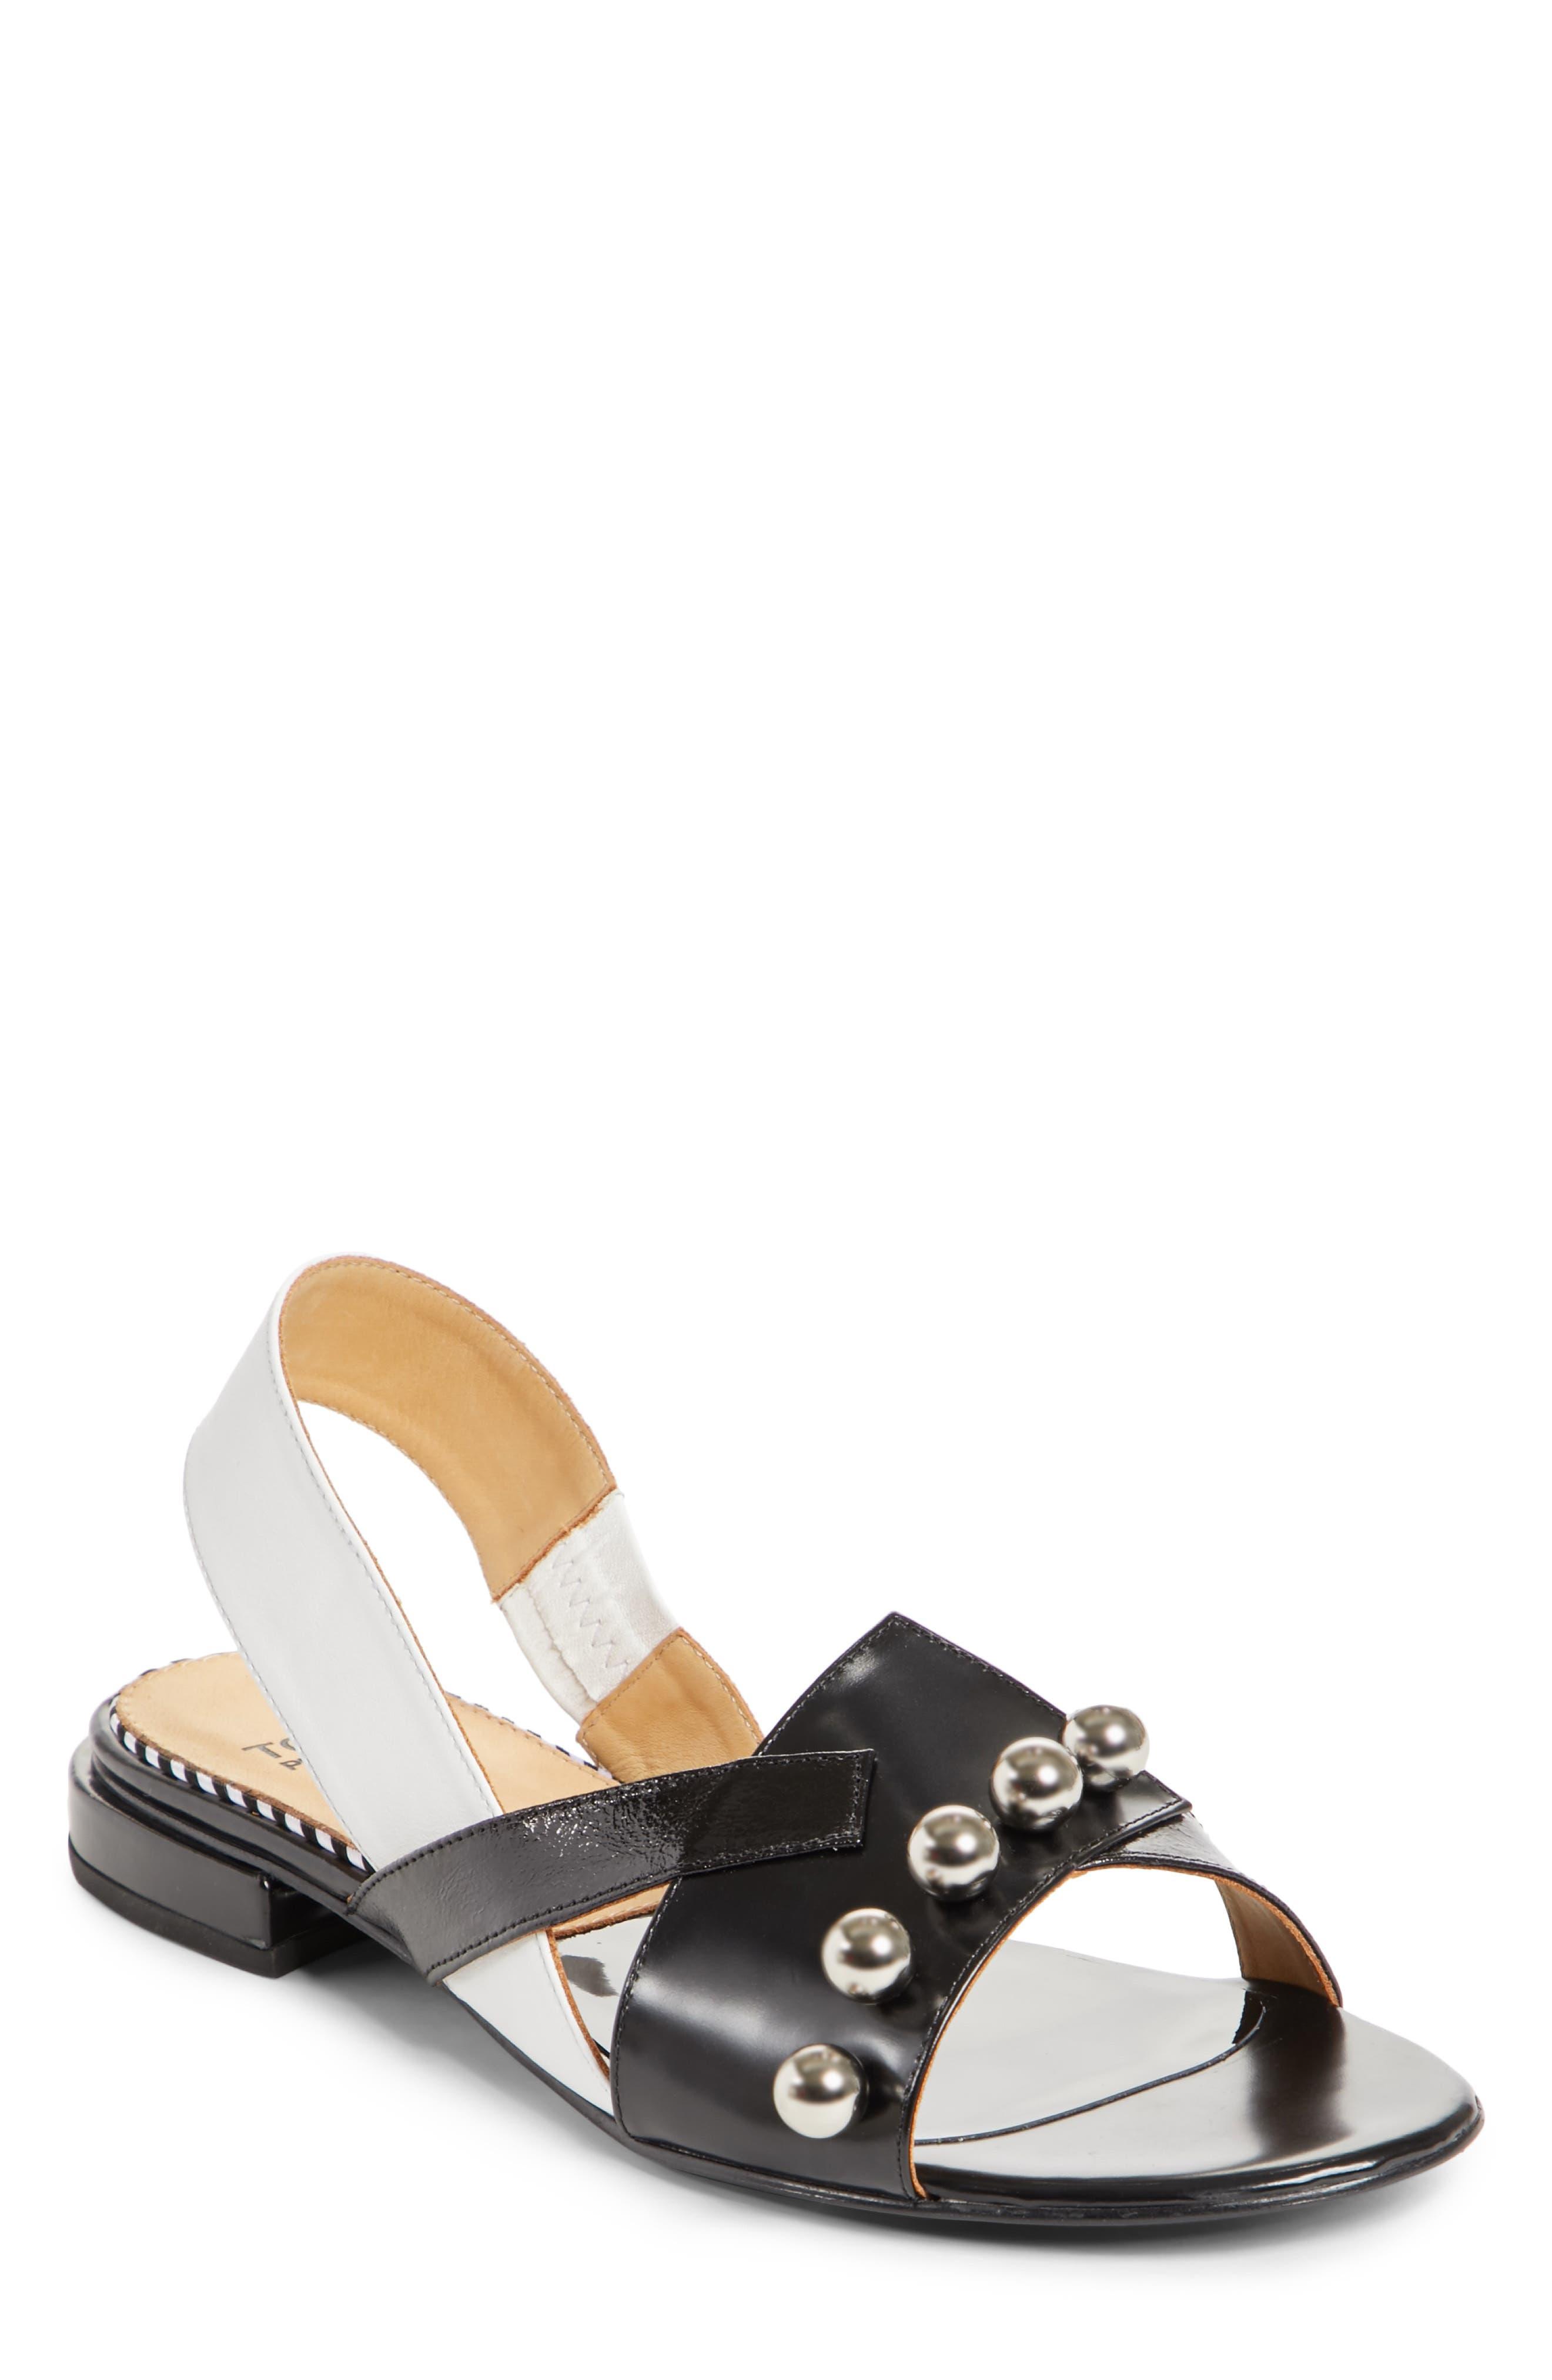 Main Image - TOGA PULLA Embellished Colorblock Slingback Sandal (Women)